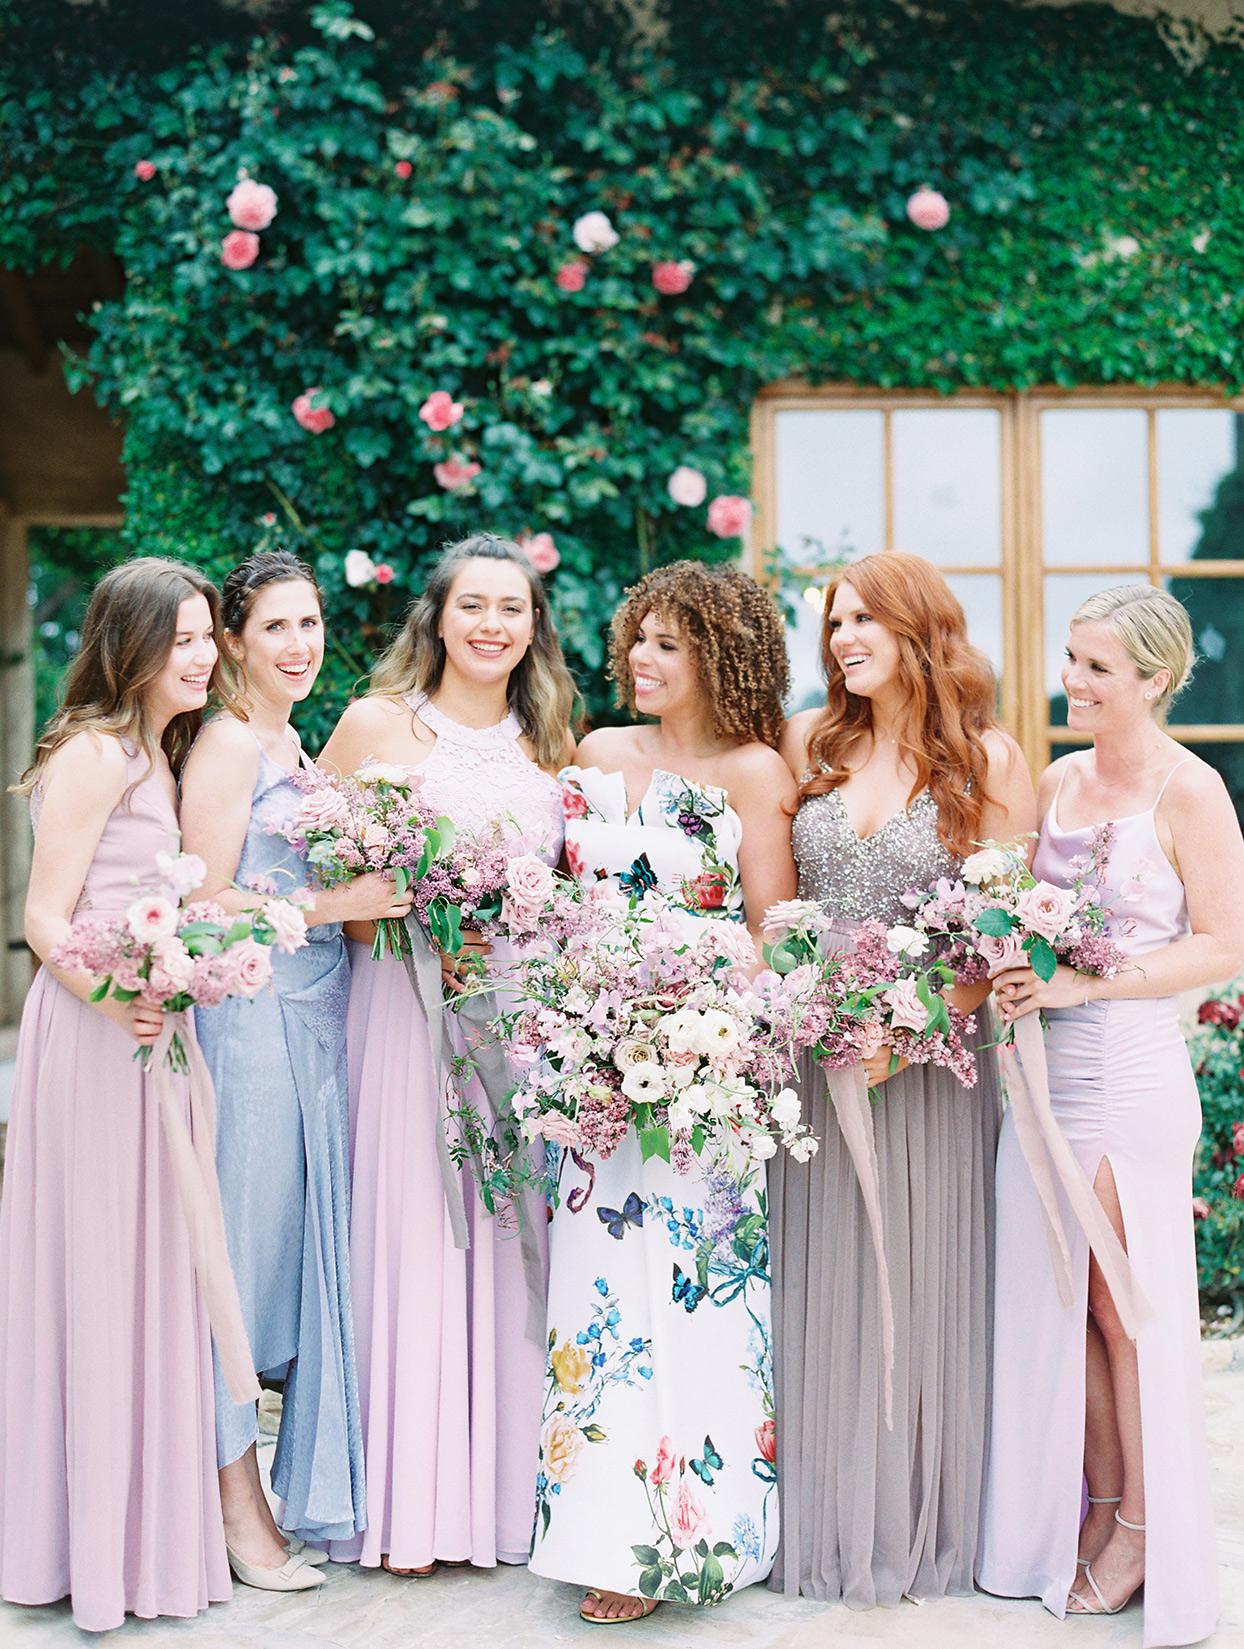 raina salih bridesmaids in pastel blue and lavender